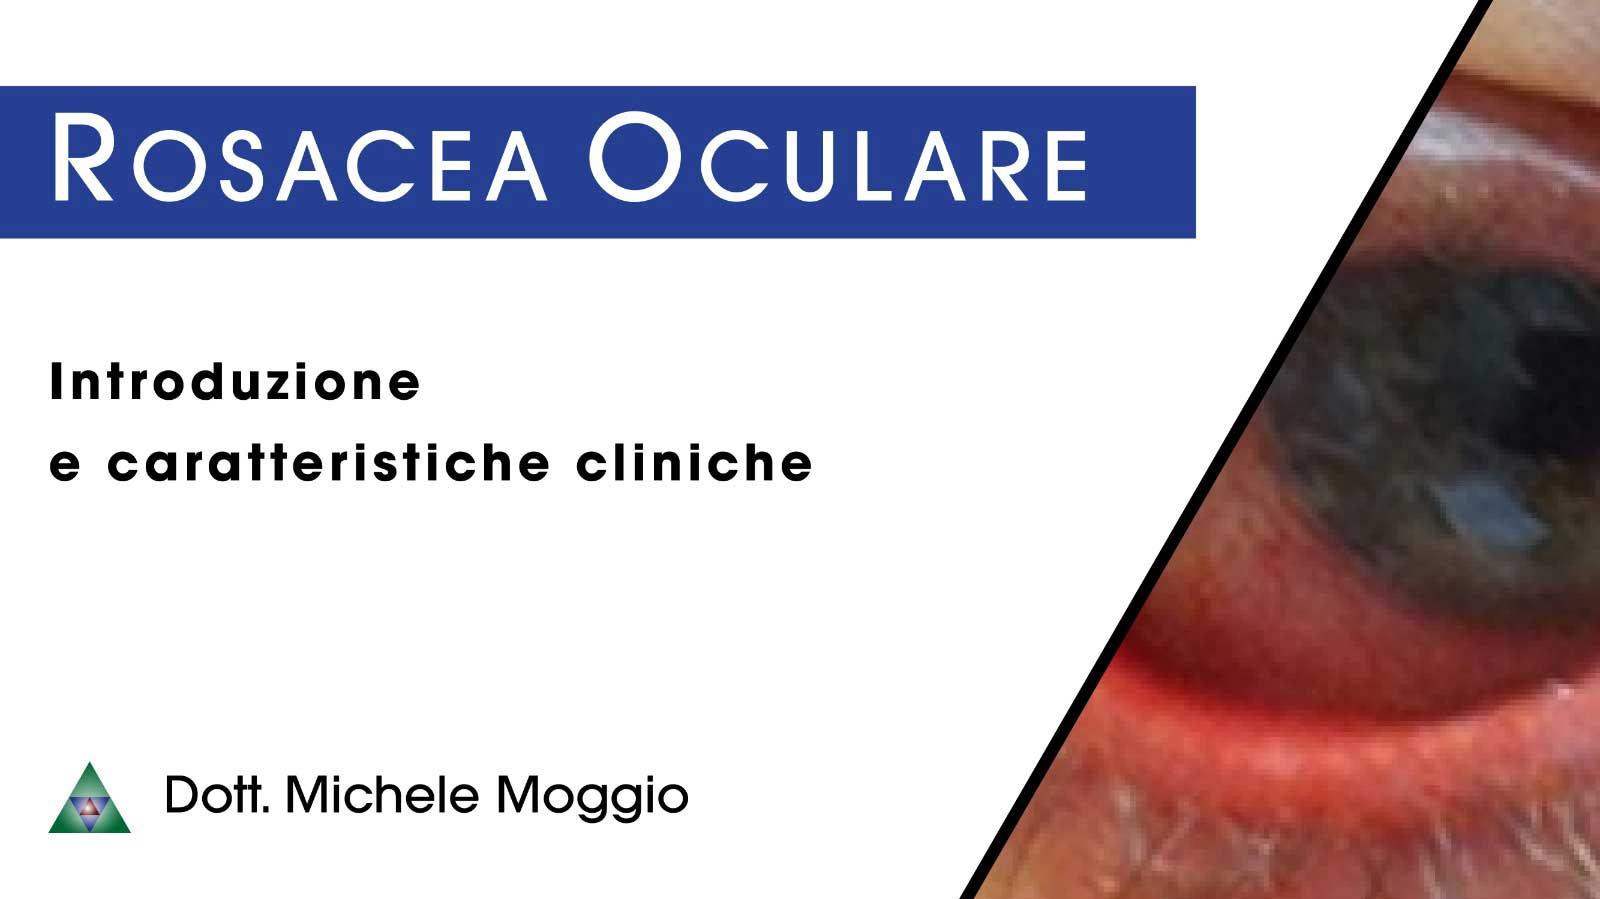 rosacea oculare - introduzione